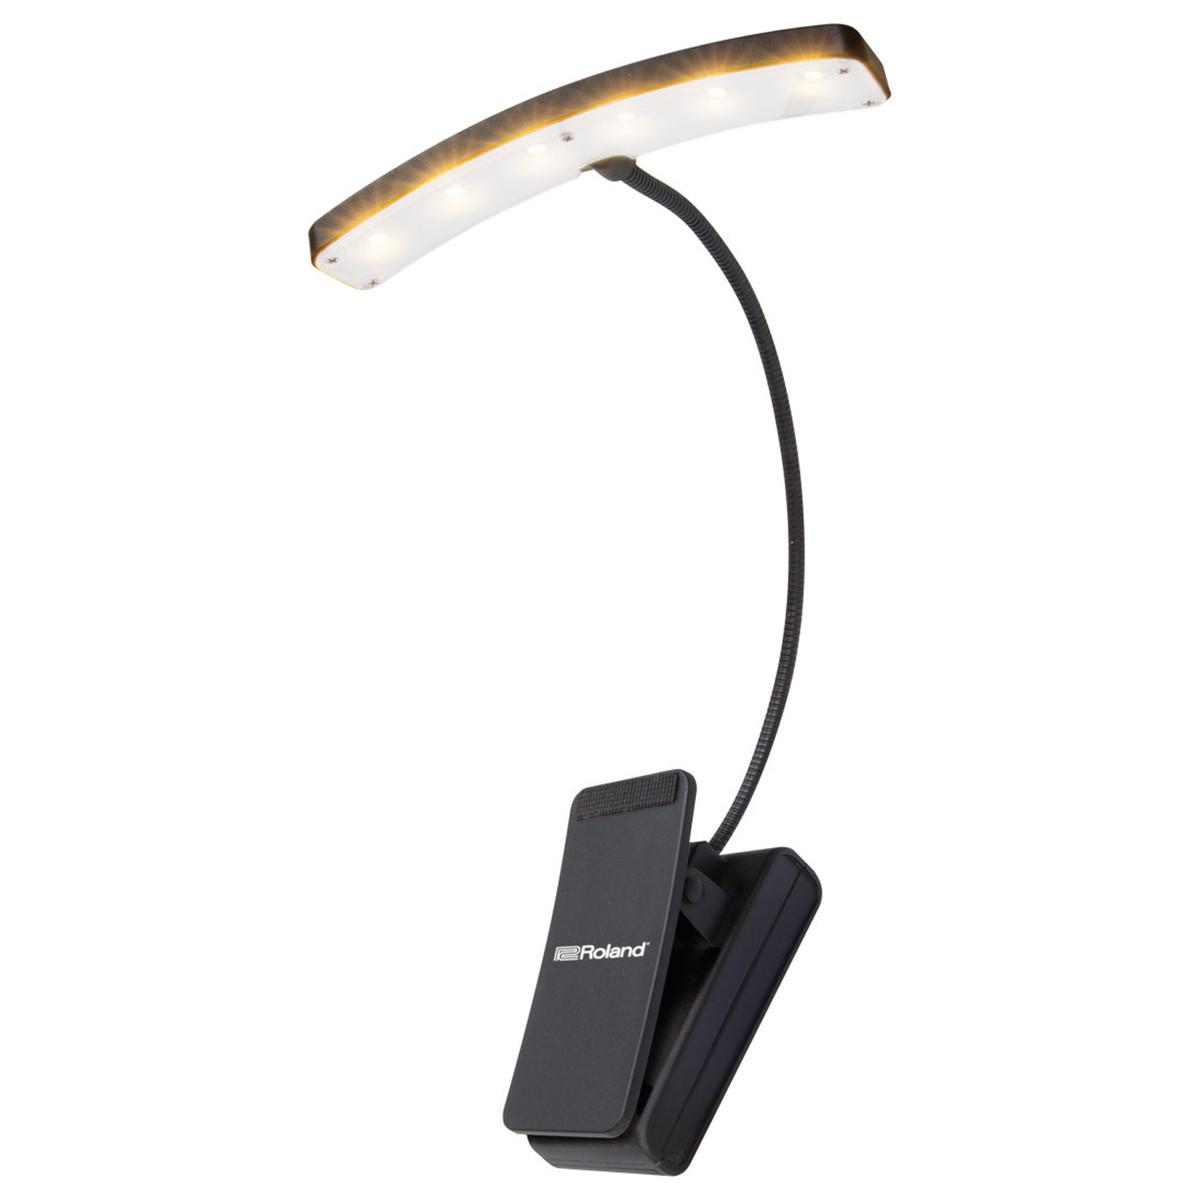 Roland Split Bar LED lampe med Klips, 10 Lyspærer | Gear4music